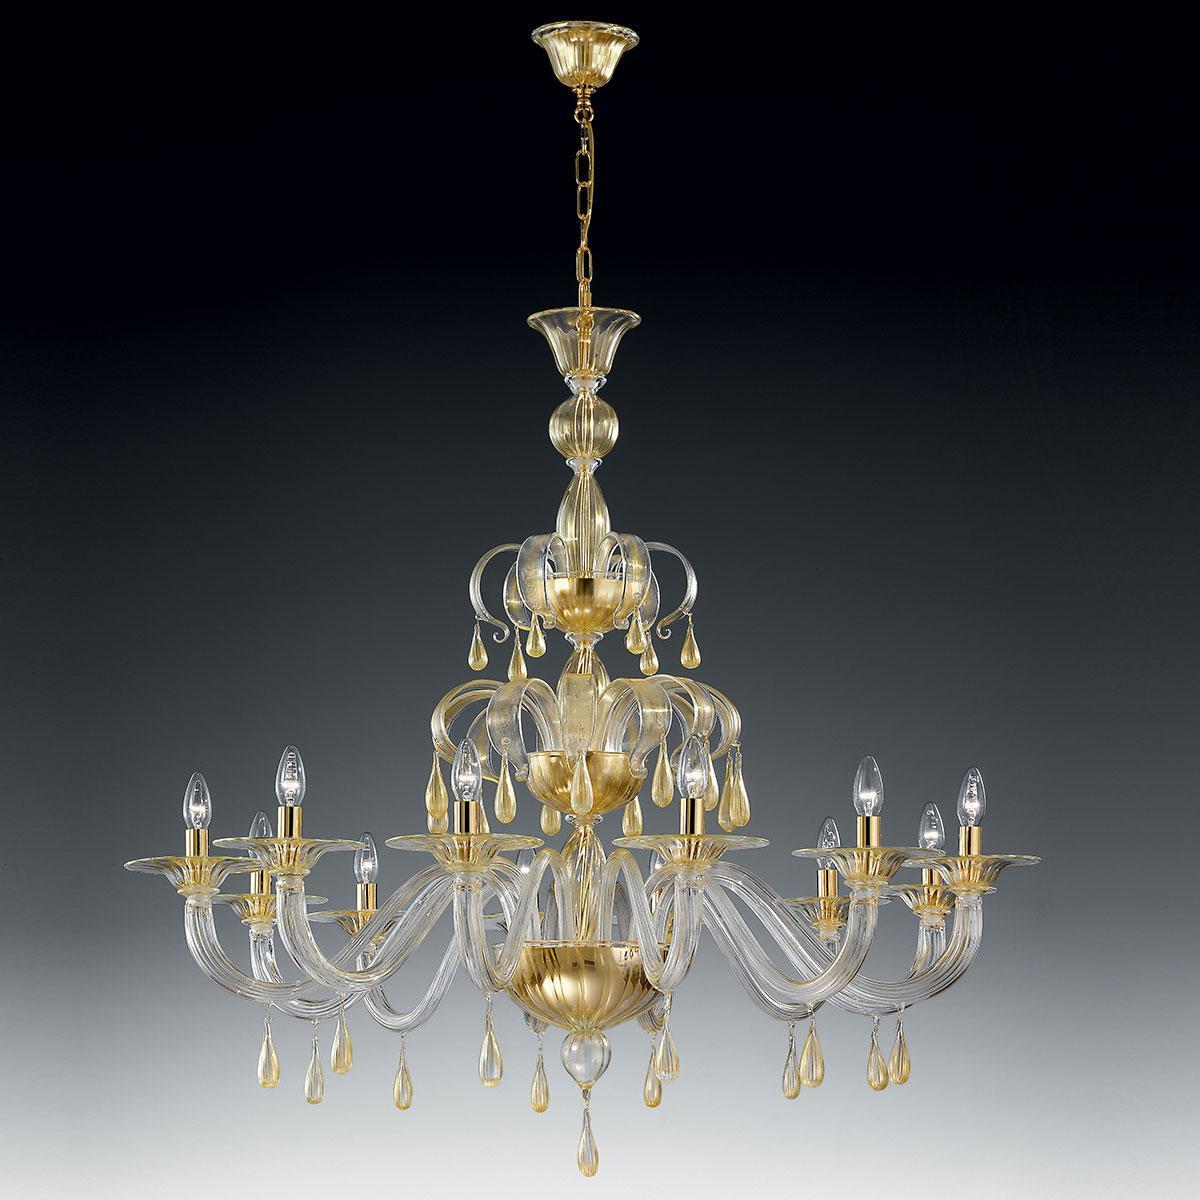 """Olivia"" Murano glas Kronleuchter - 12 flammig - gold"